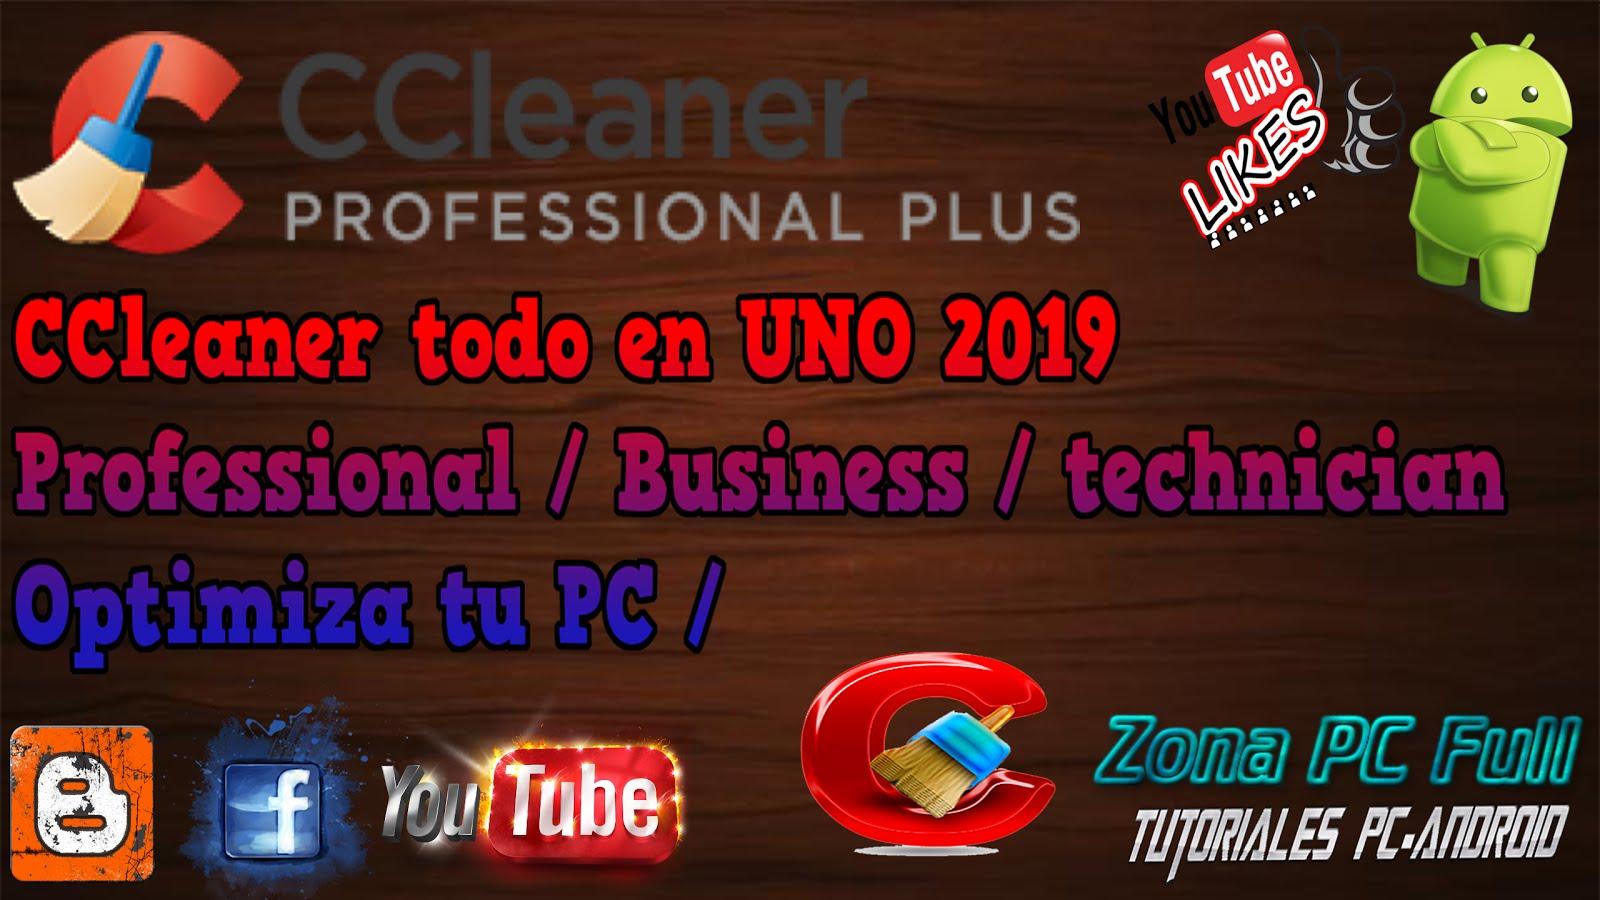 ccleaner professional plus full español 2018 mega